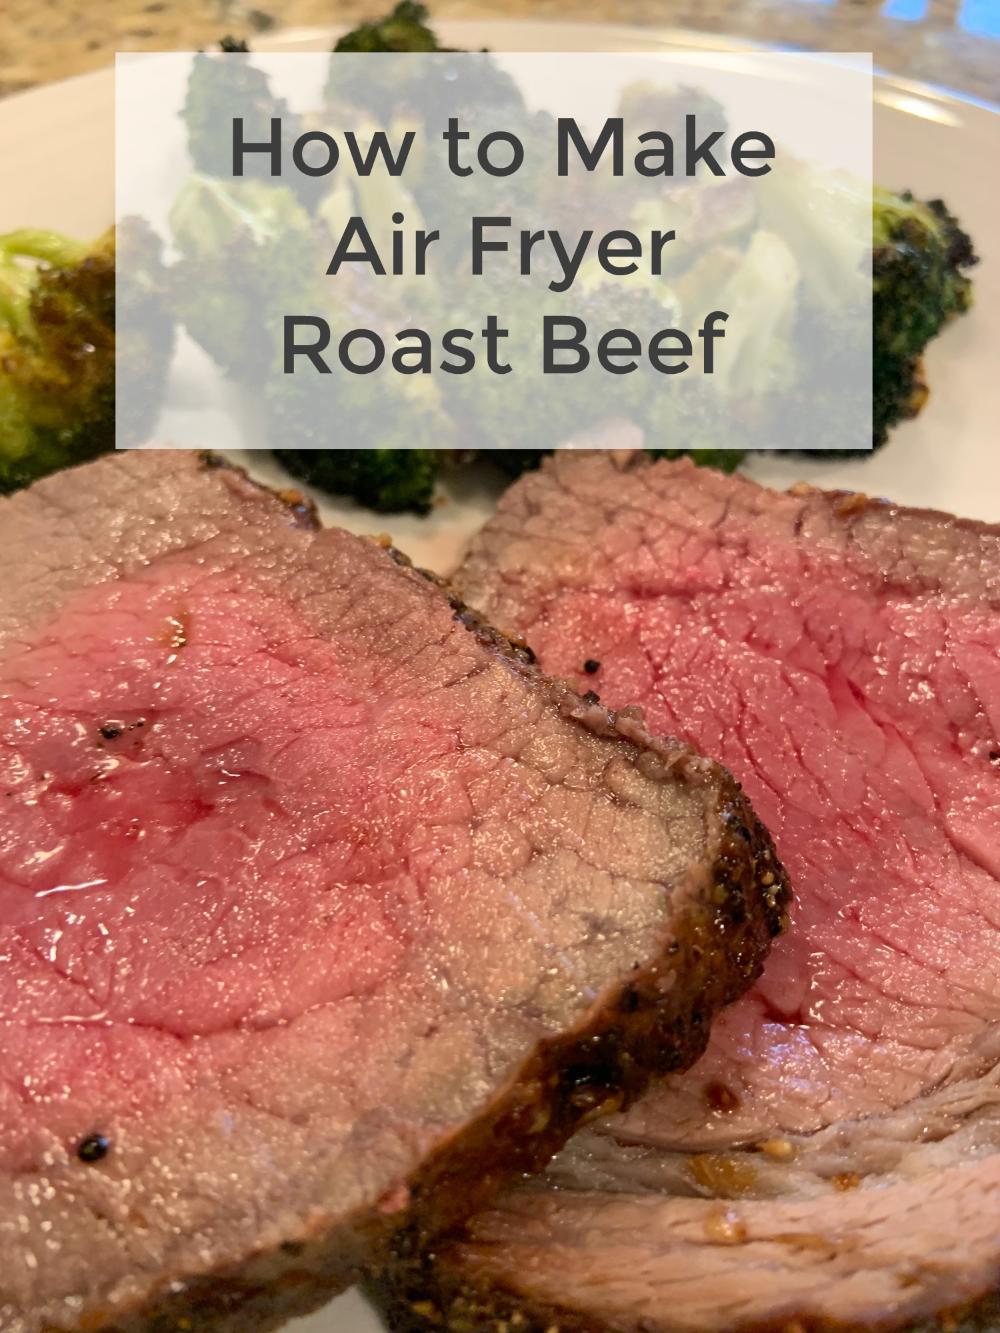 Air Fryer Roast Beef (Instant Pot Vortex and Omni